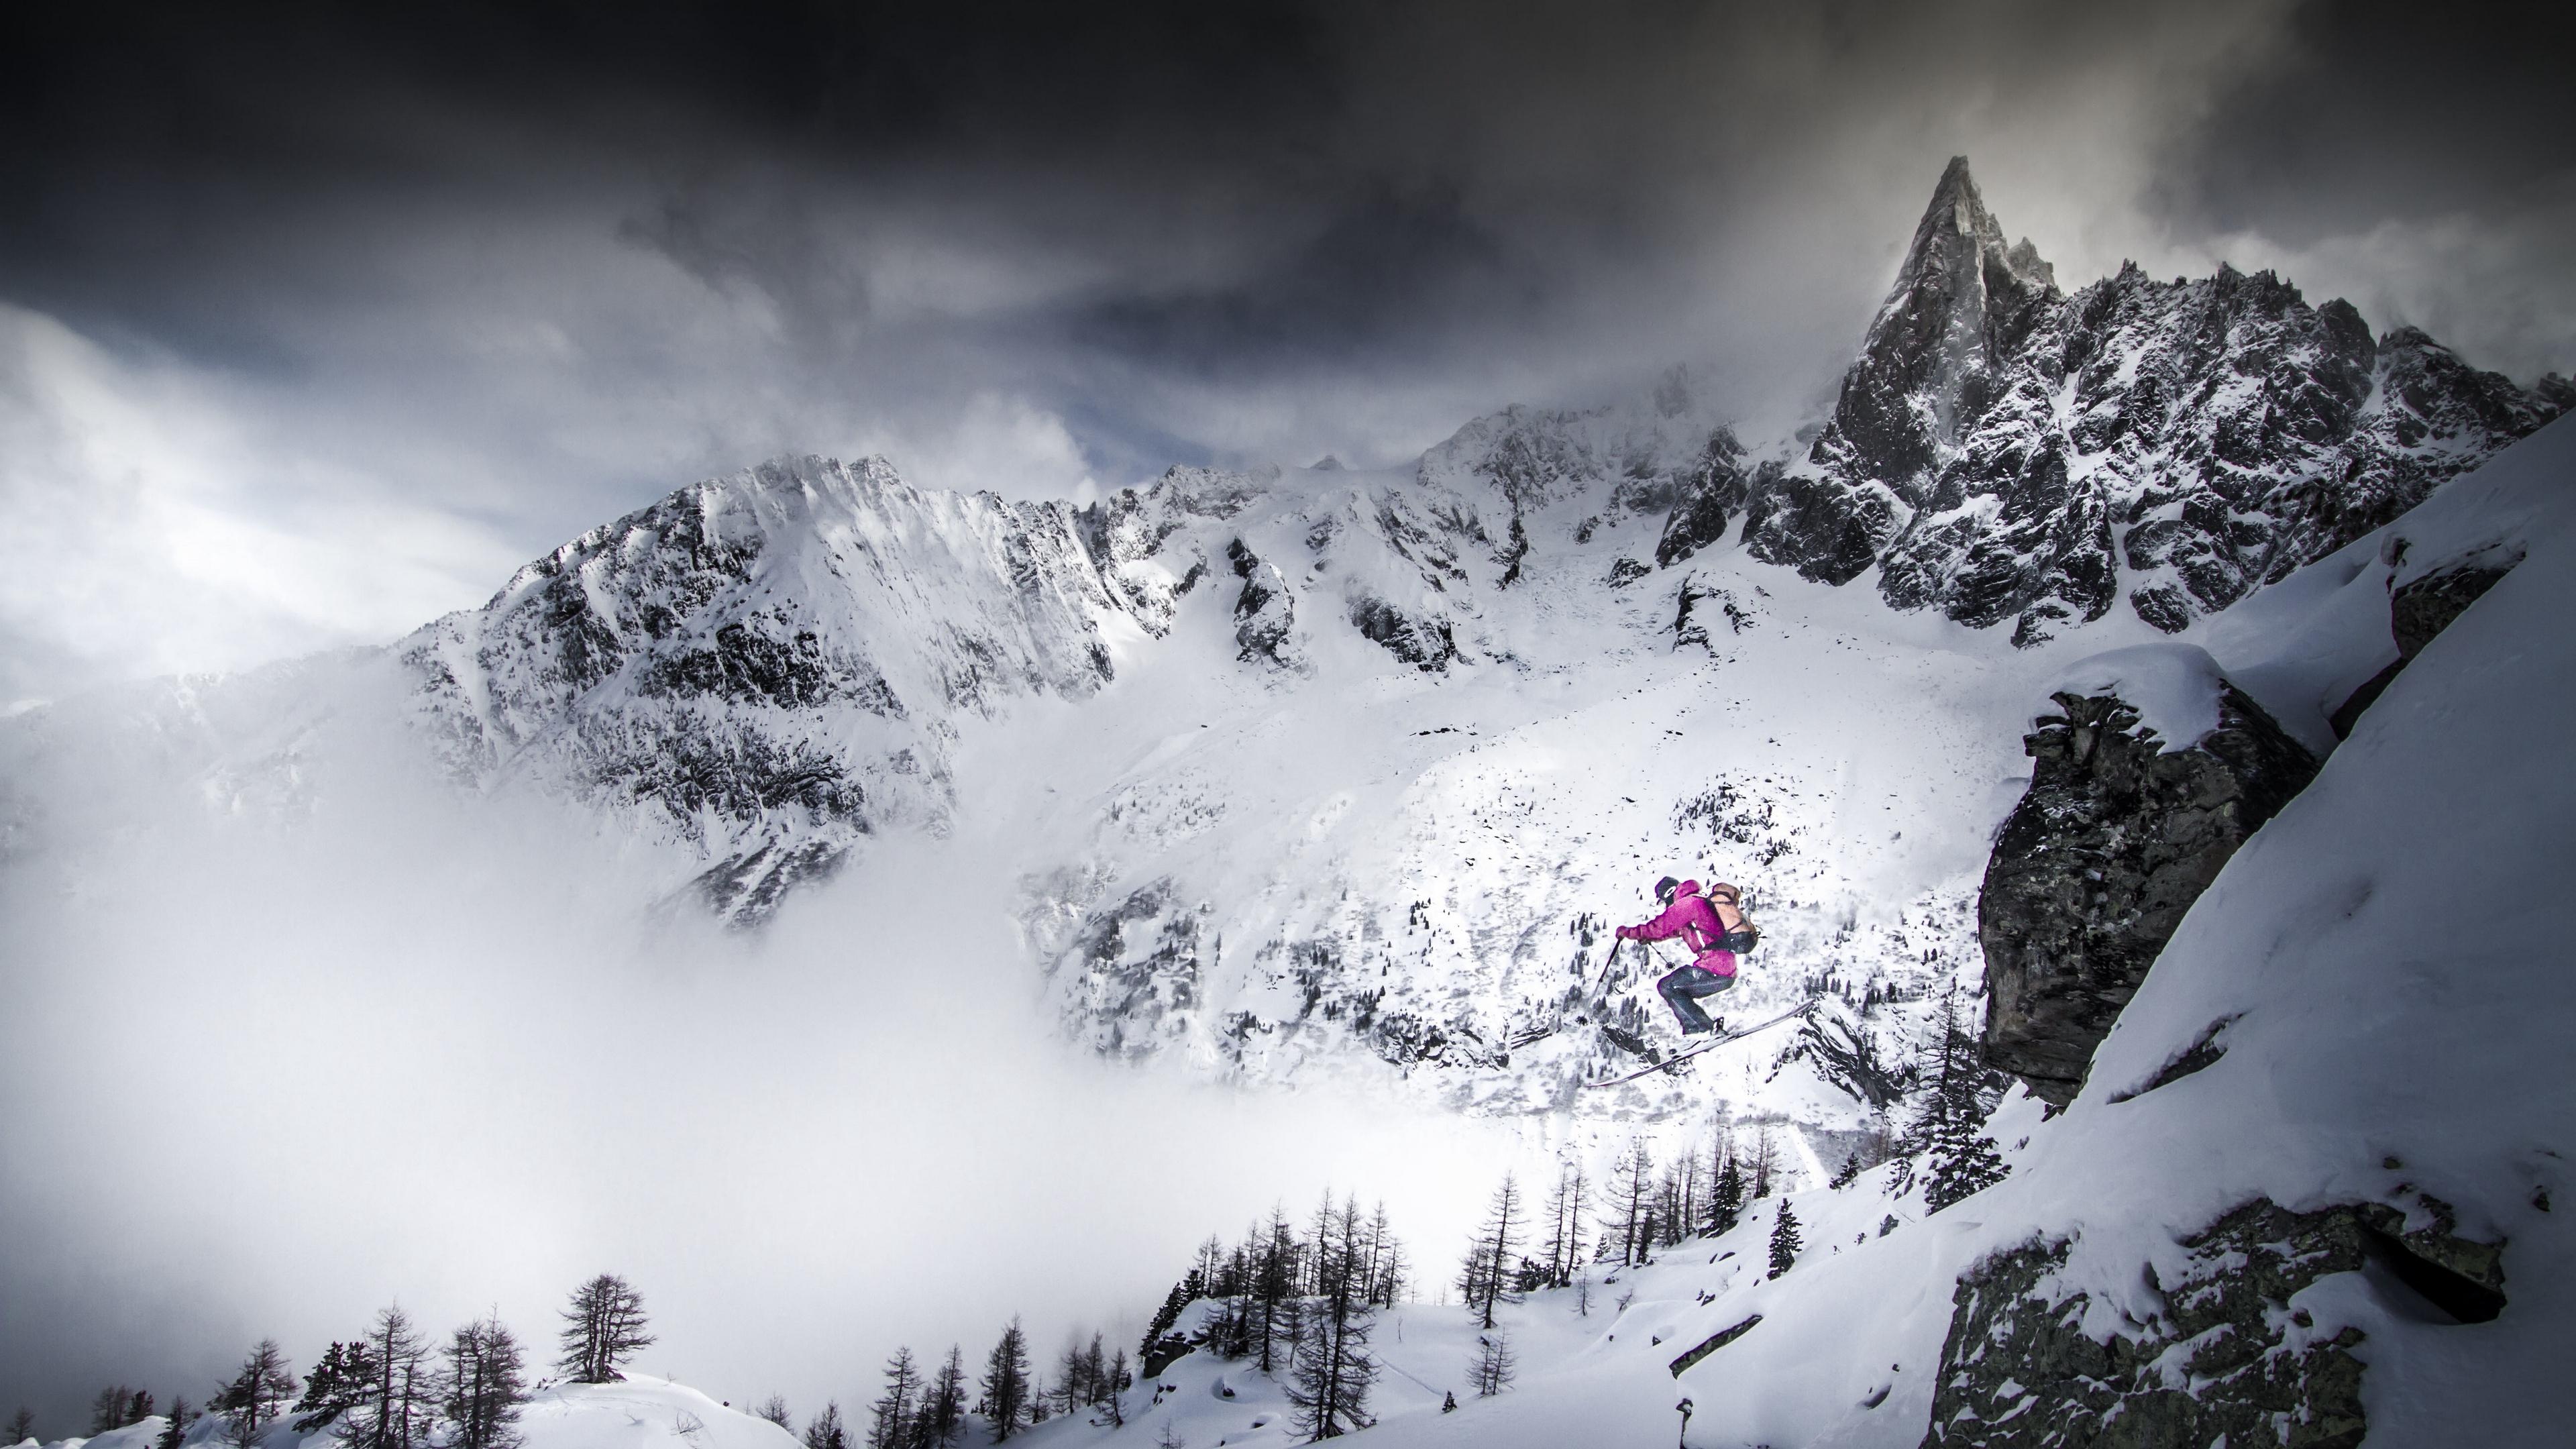 skiing skier jump mountains snow 4k 1540063422 - skiing, skier, jump, mountains, snow 4k - Skiing, skier, jump